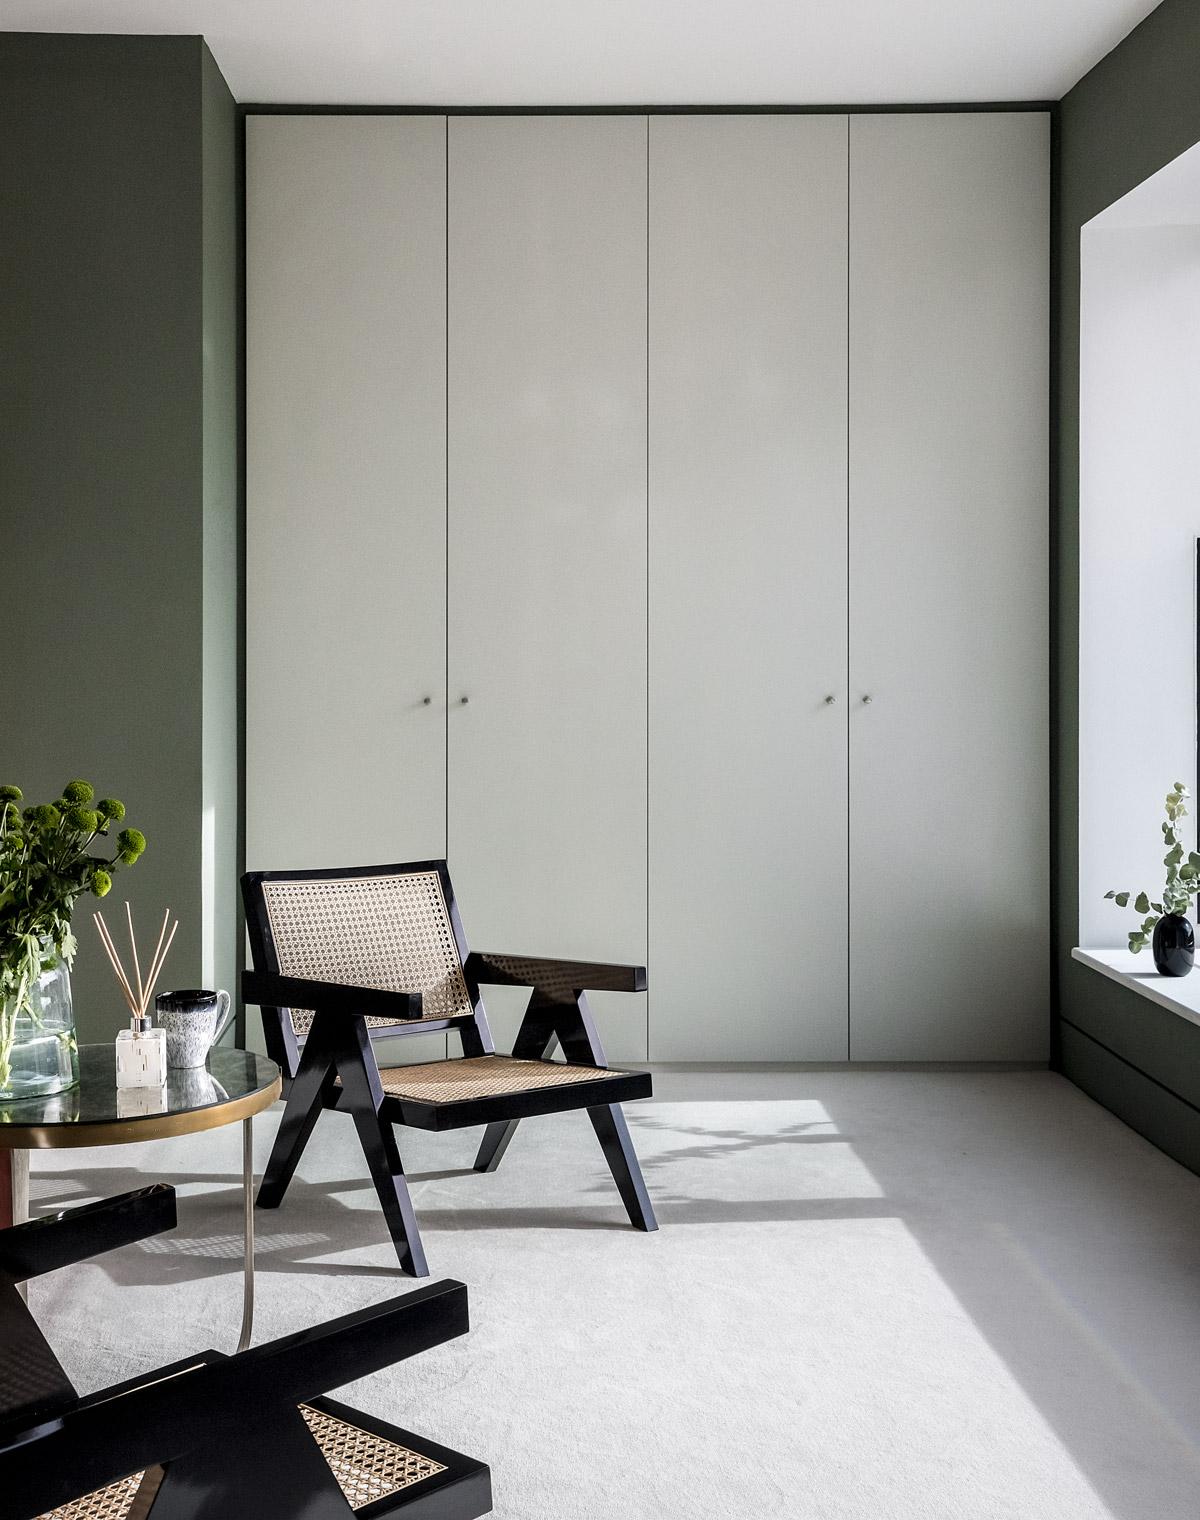 loft apartment, Loft Apartment Designed to Reflect its Urban Soho Surroundings